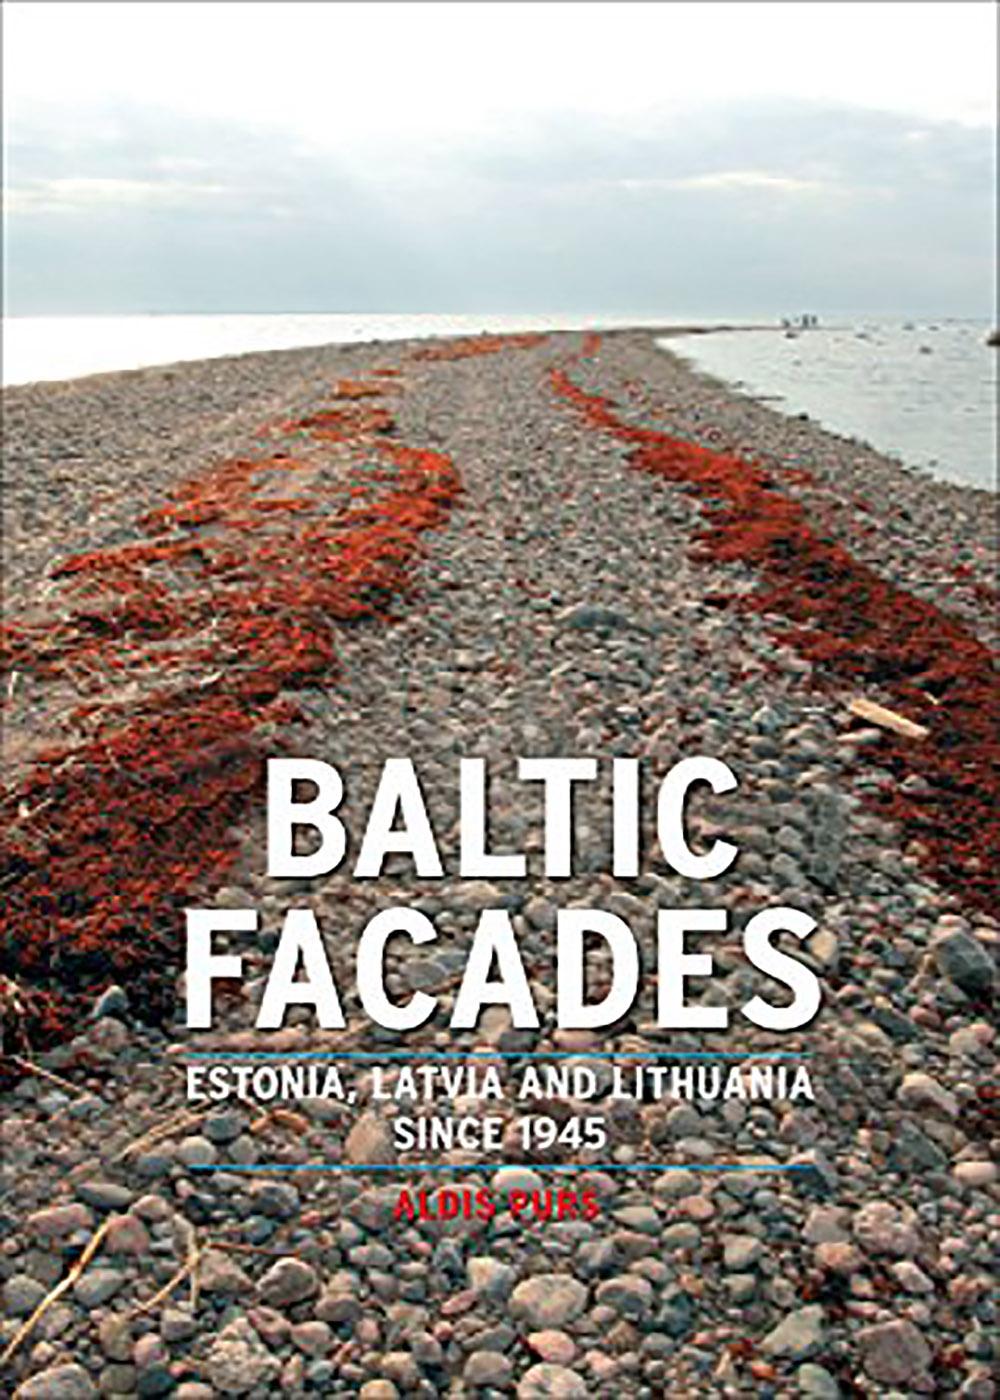 Aldis Purs - Baltic Facades